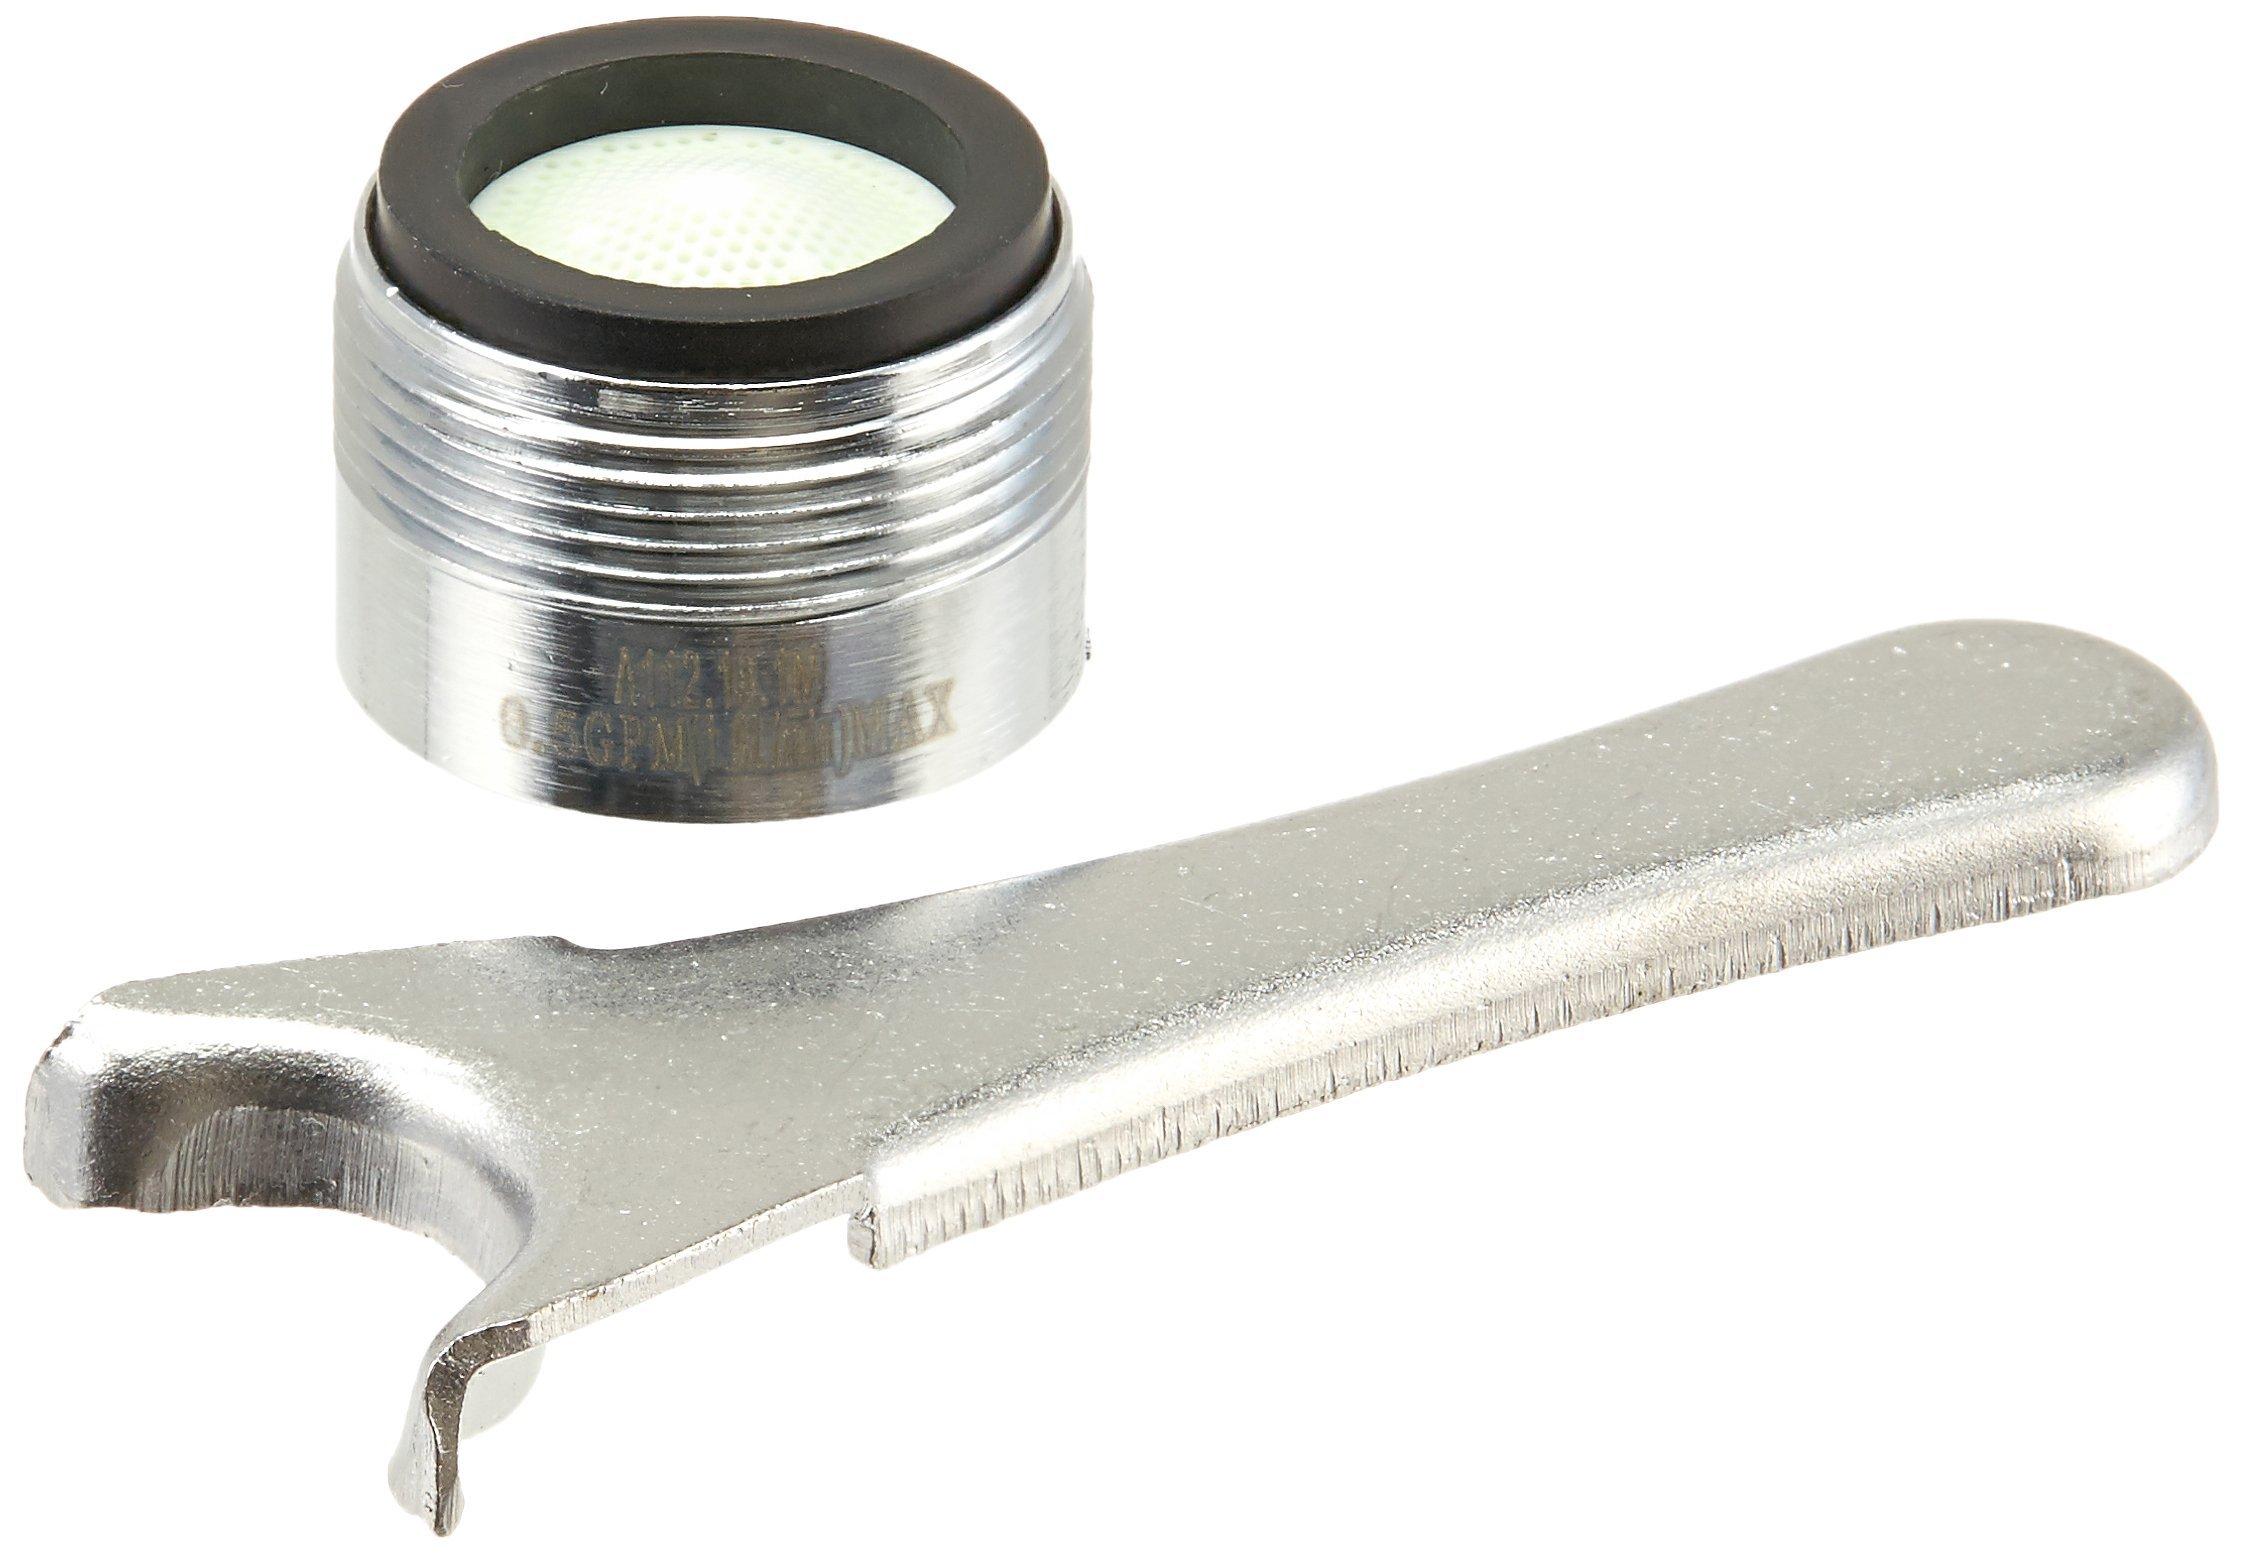 Danze DA613075N Junior Male Spray Faucet Aerator Kit, 0.5 GPM, Chrome by Danze